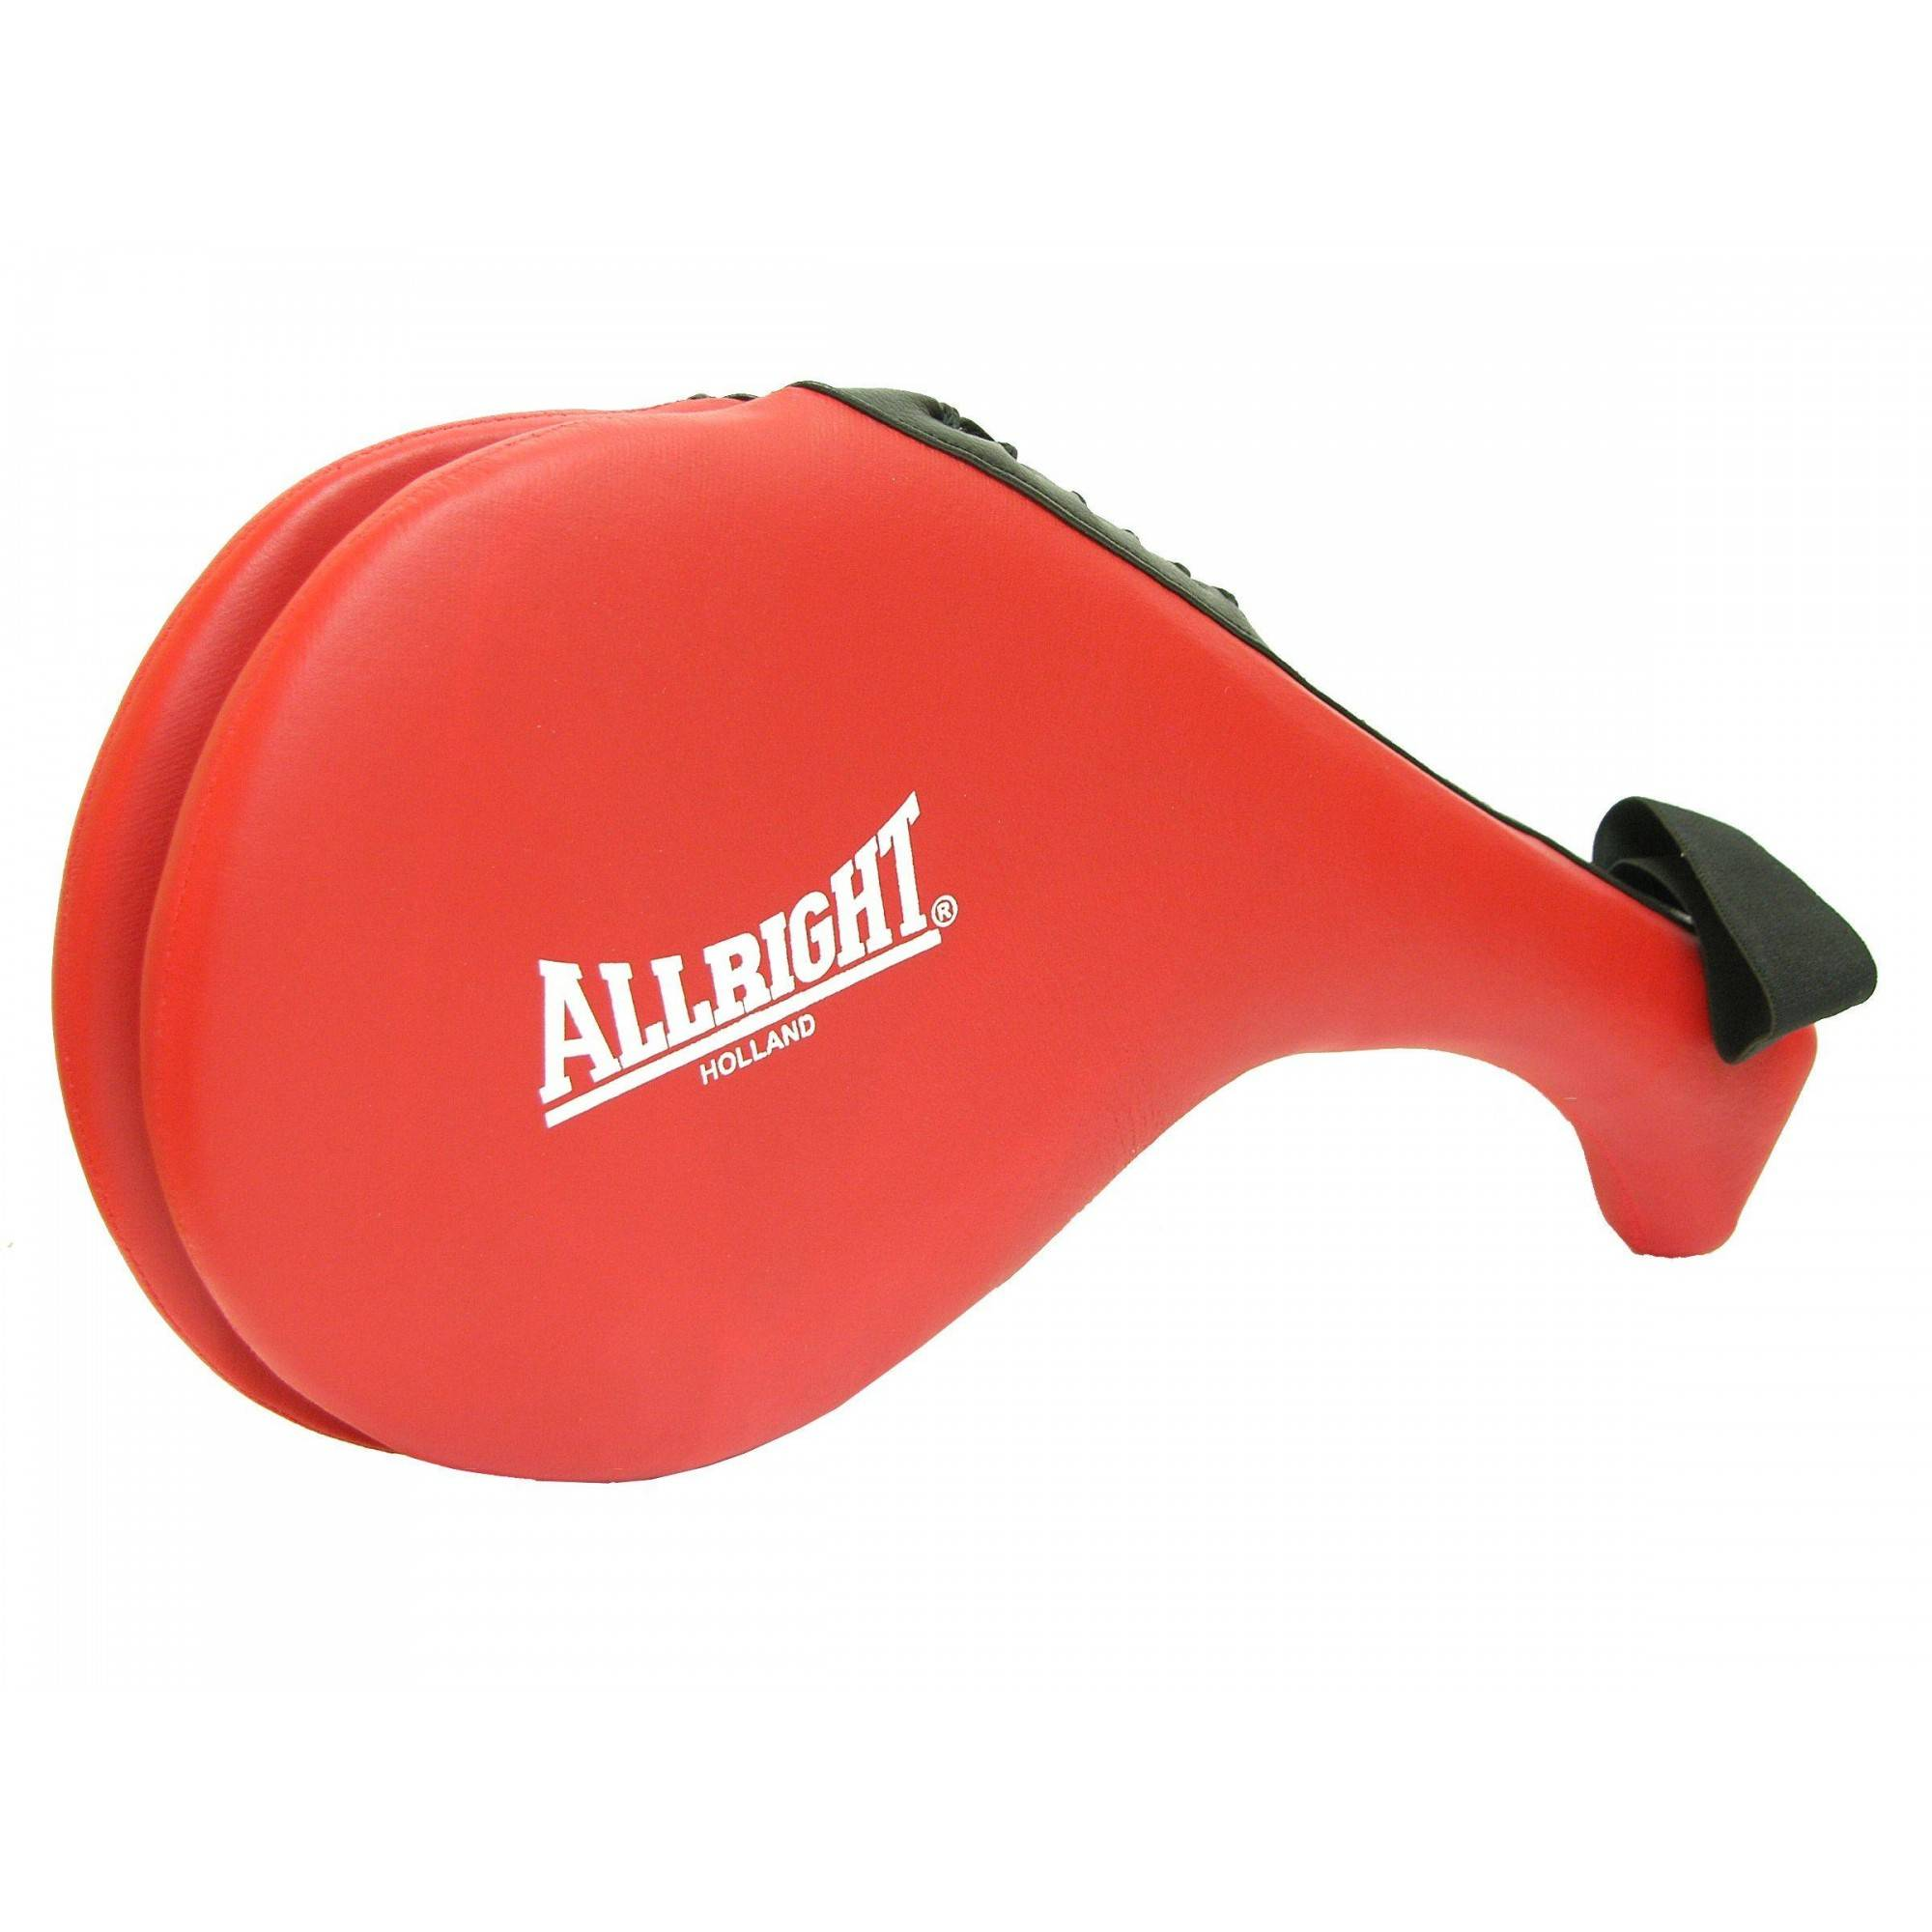 Packa do taekwondo podwójna Allright czerwona | skóra PU,producent: ALLRIGHT, zdjecie photo: 1 | online shop klubfitness.pl | sp